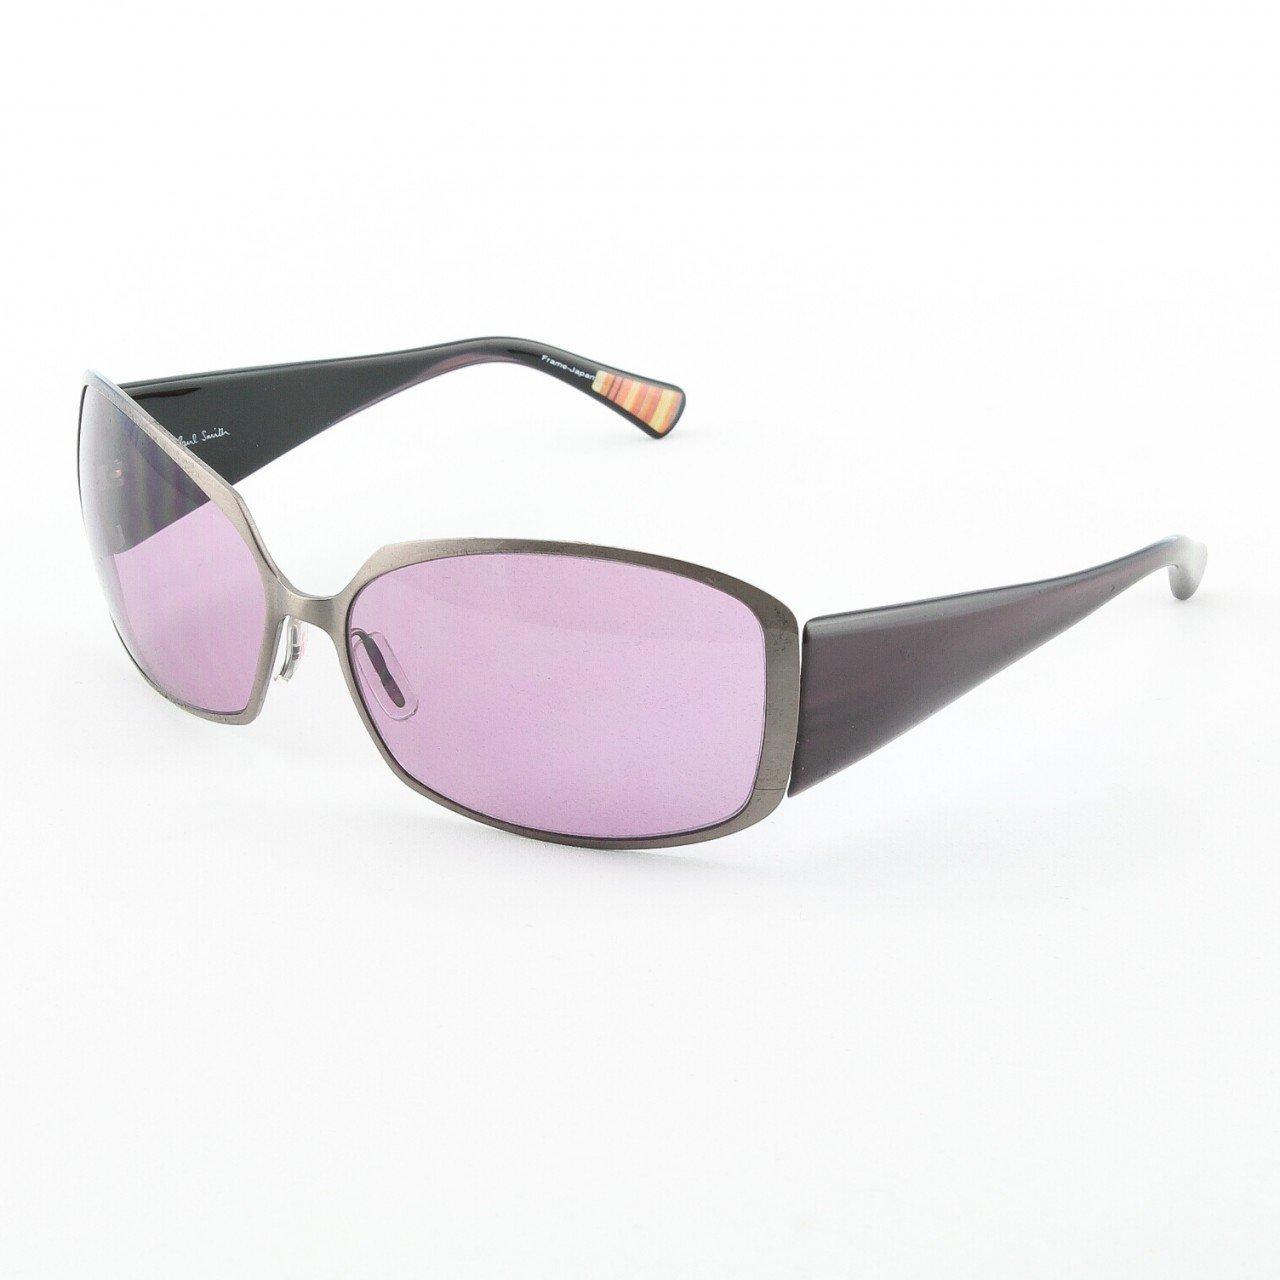 Paul Smith PS-810 MD Sunglasses Color Bronze Purple with Purple Lenses 62mm